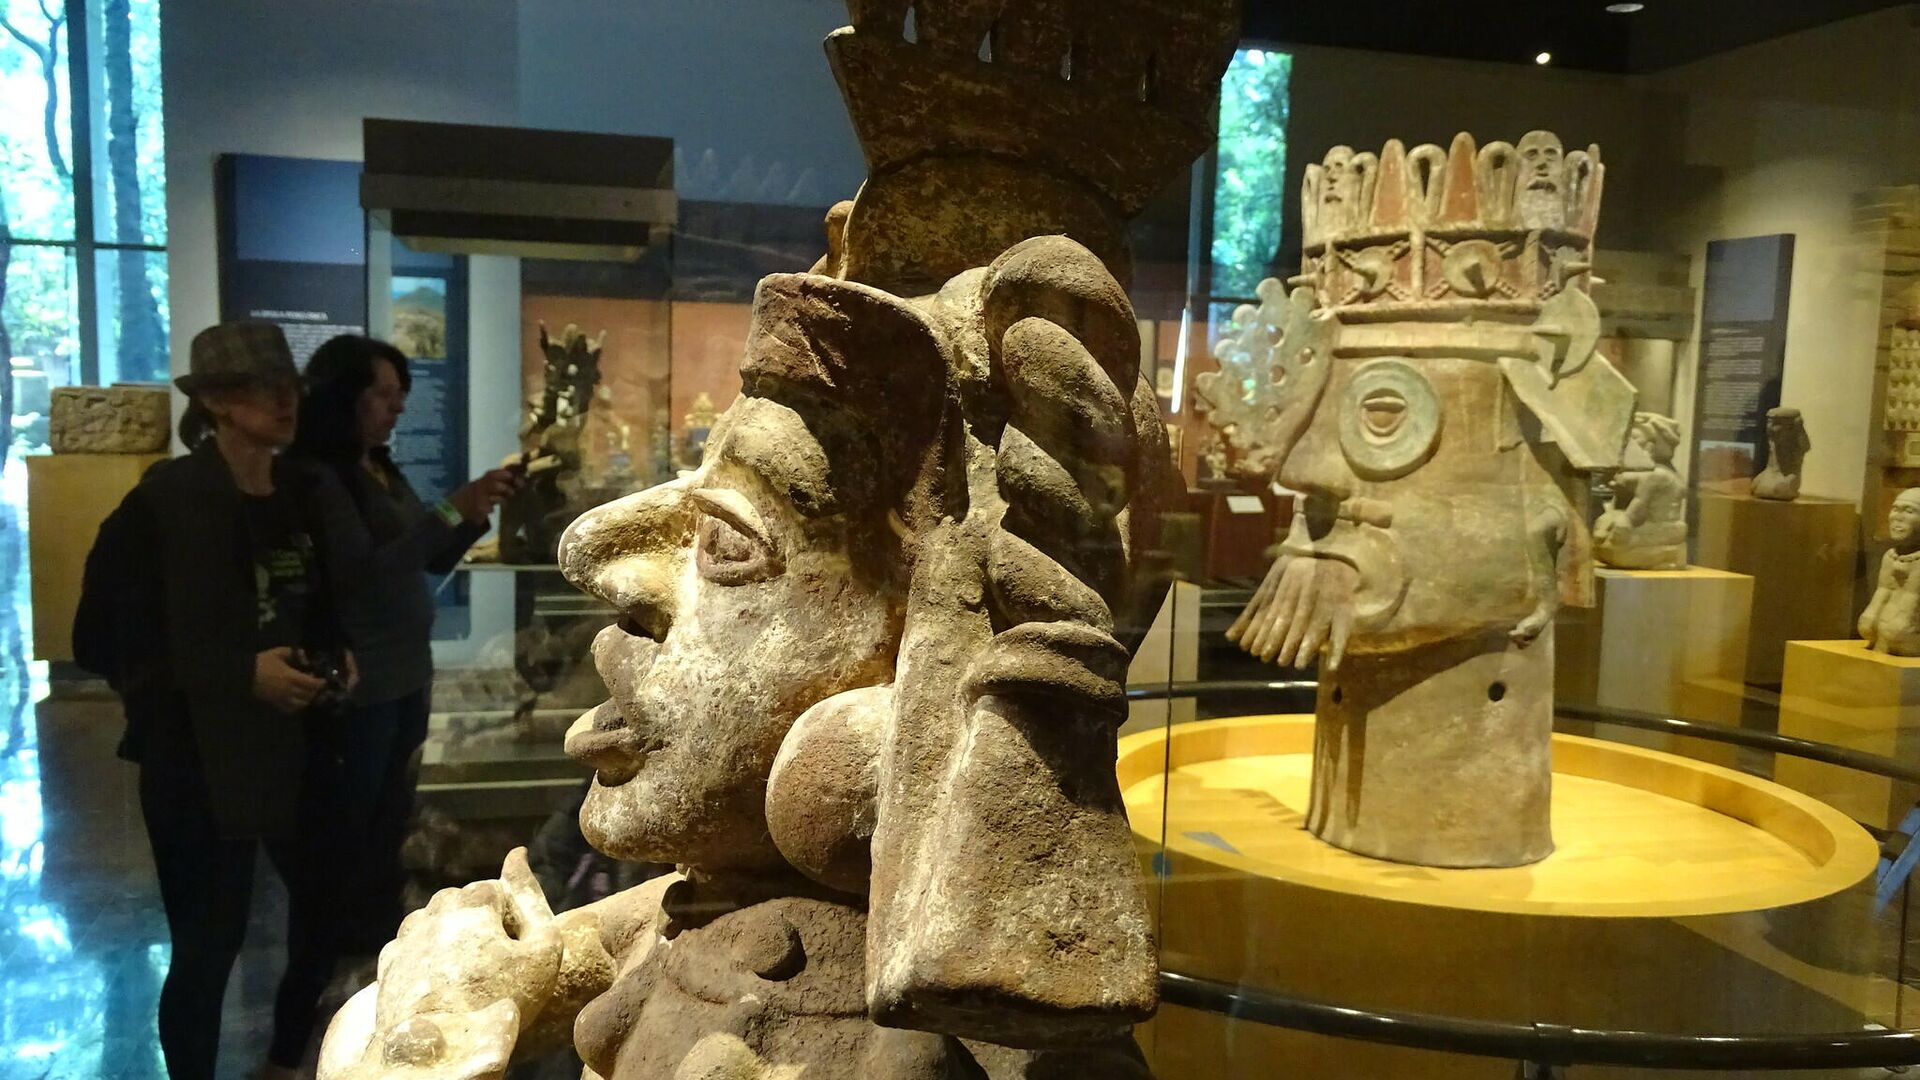 Piezas de la cultura maya (Archivo) - Sputnik Mundo, 1920, 14.04.2021